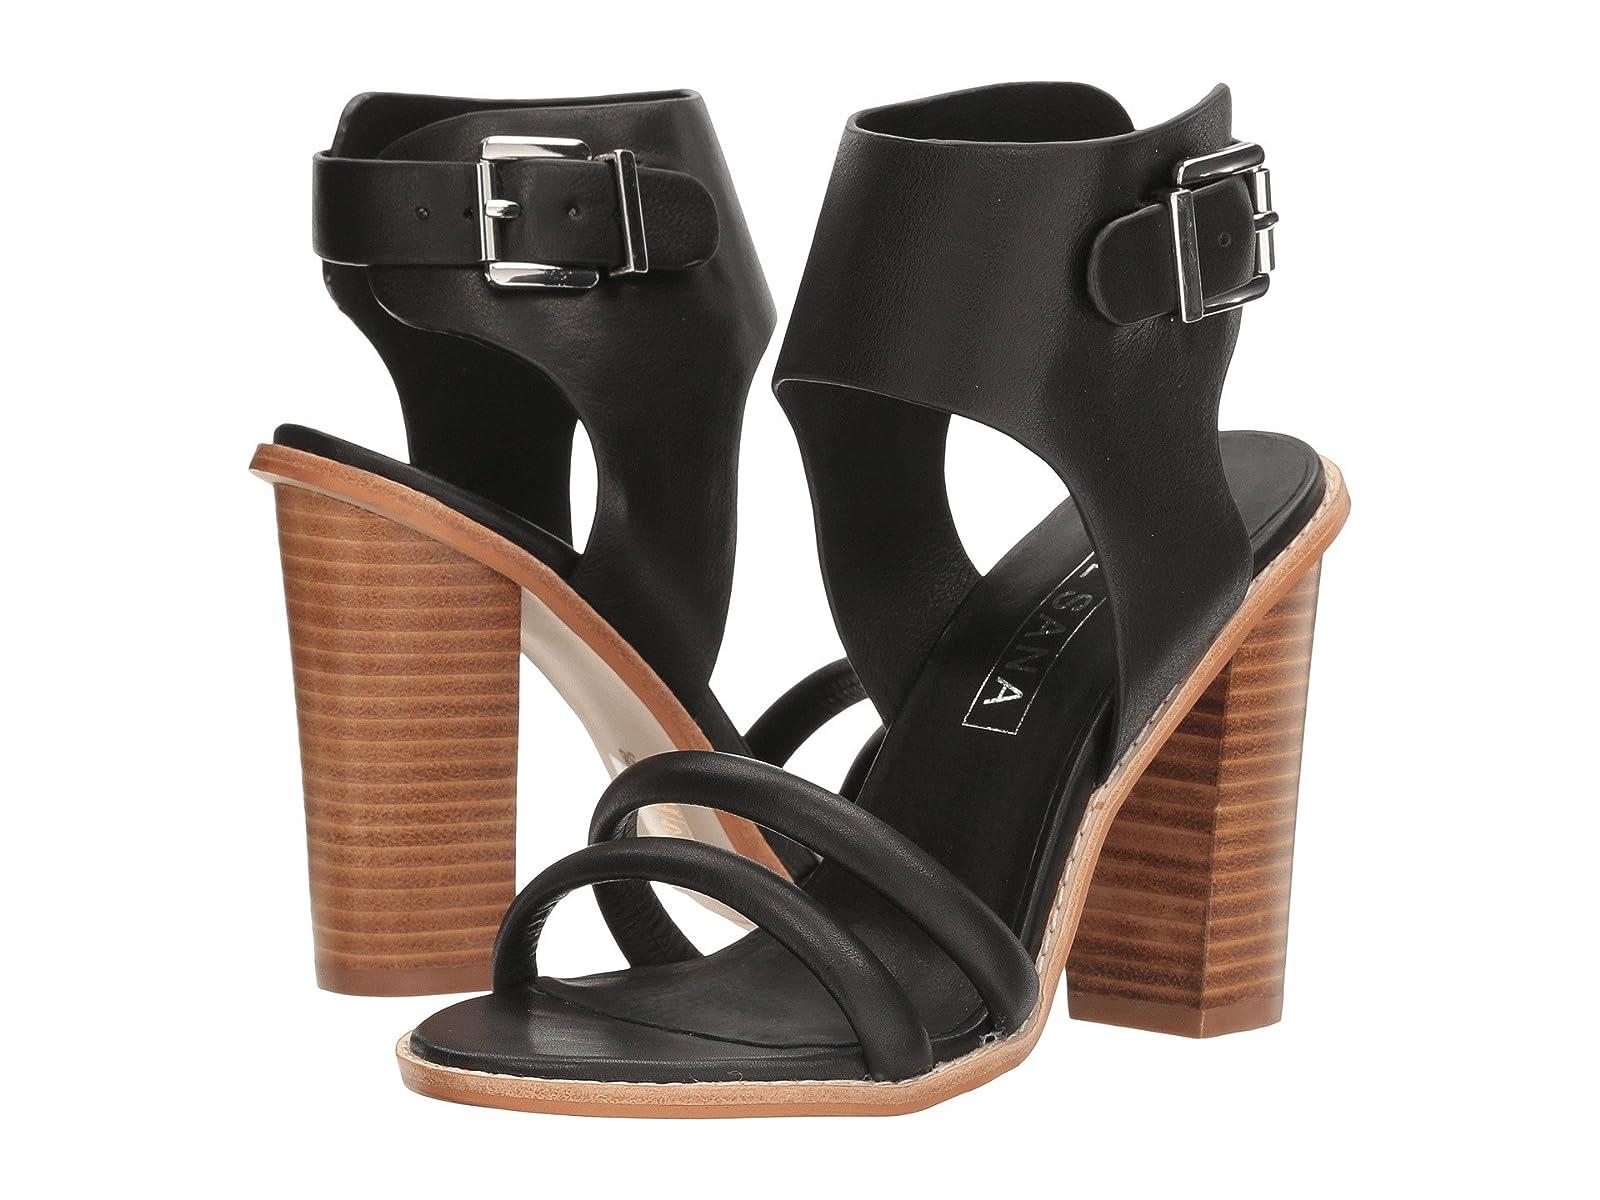 Sol Sana Tiki Product/Man/Woman Heel / High Quality Product/Man/Woman Tiki 015ada